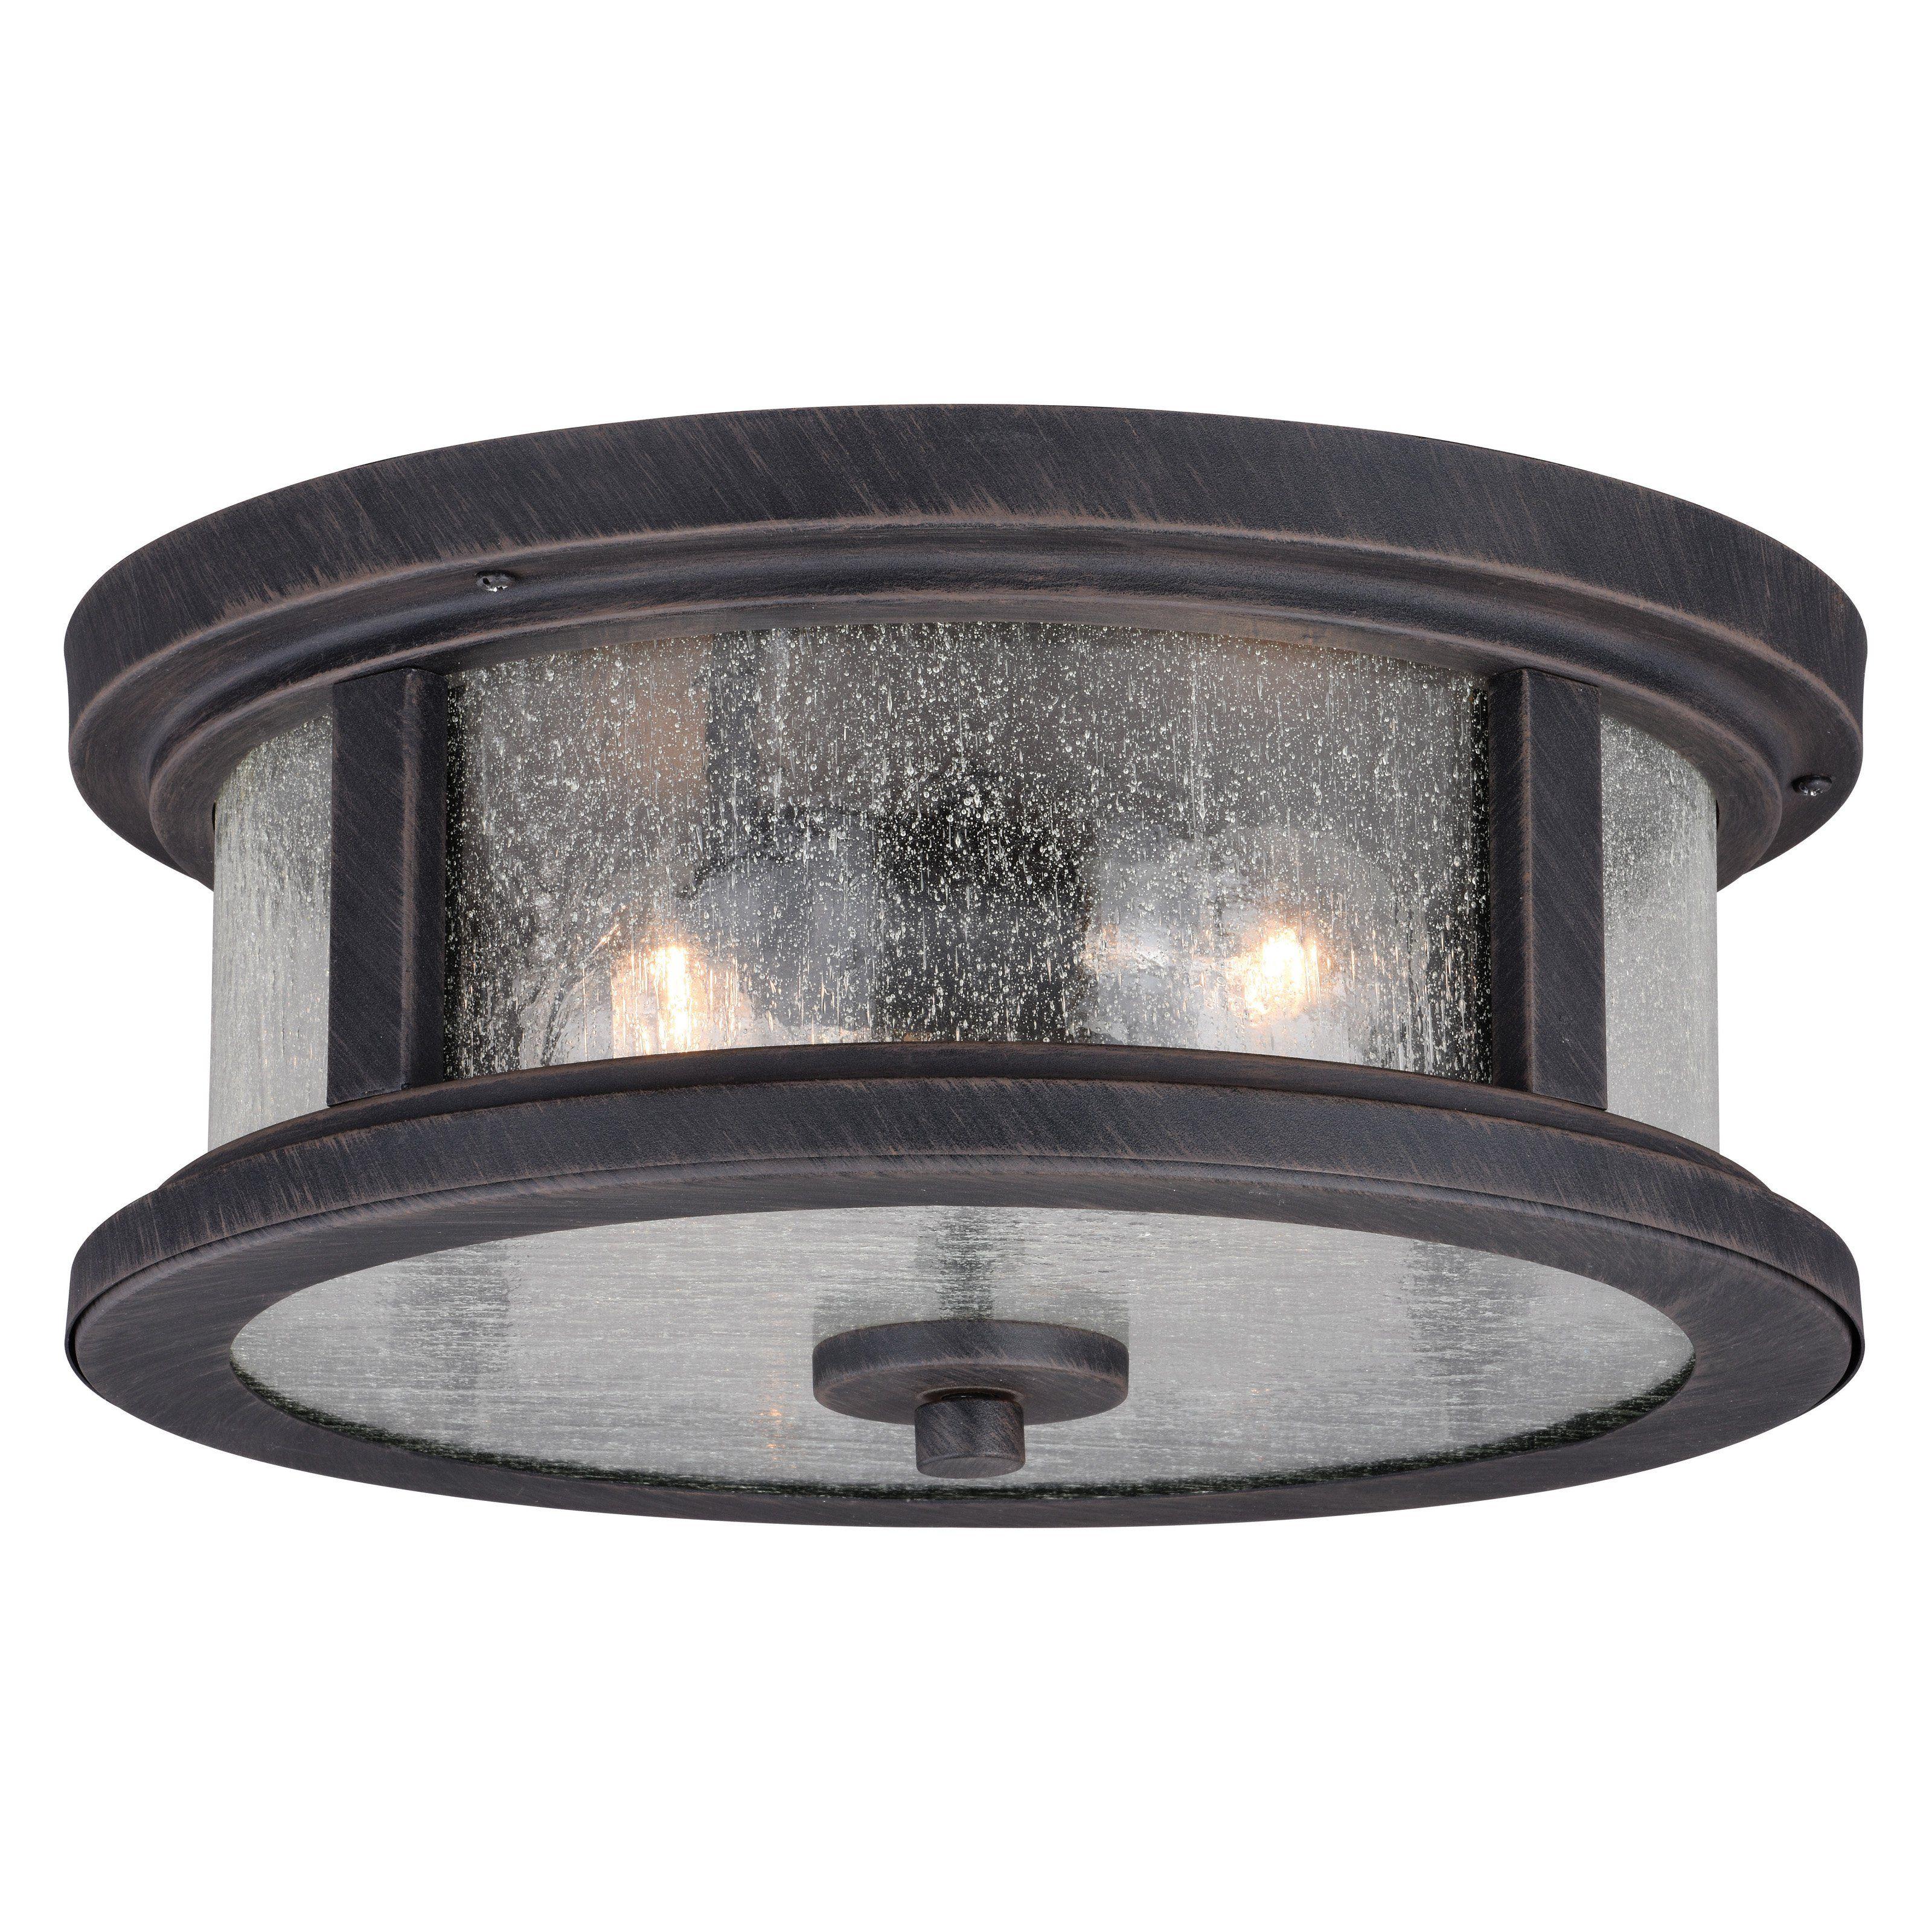 Vaxcel Cumberland T0290 Outdoor Flush Mount Light Outdoor Ceiling Lights Outdoor Flush Mounts Flush Mount Lighting